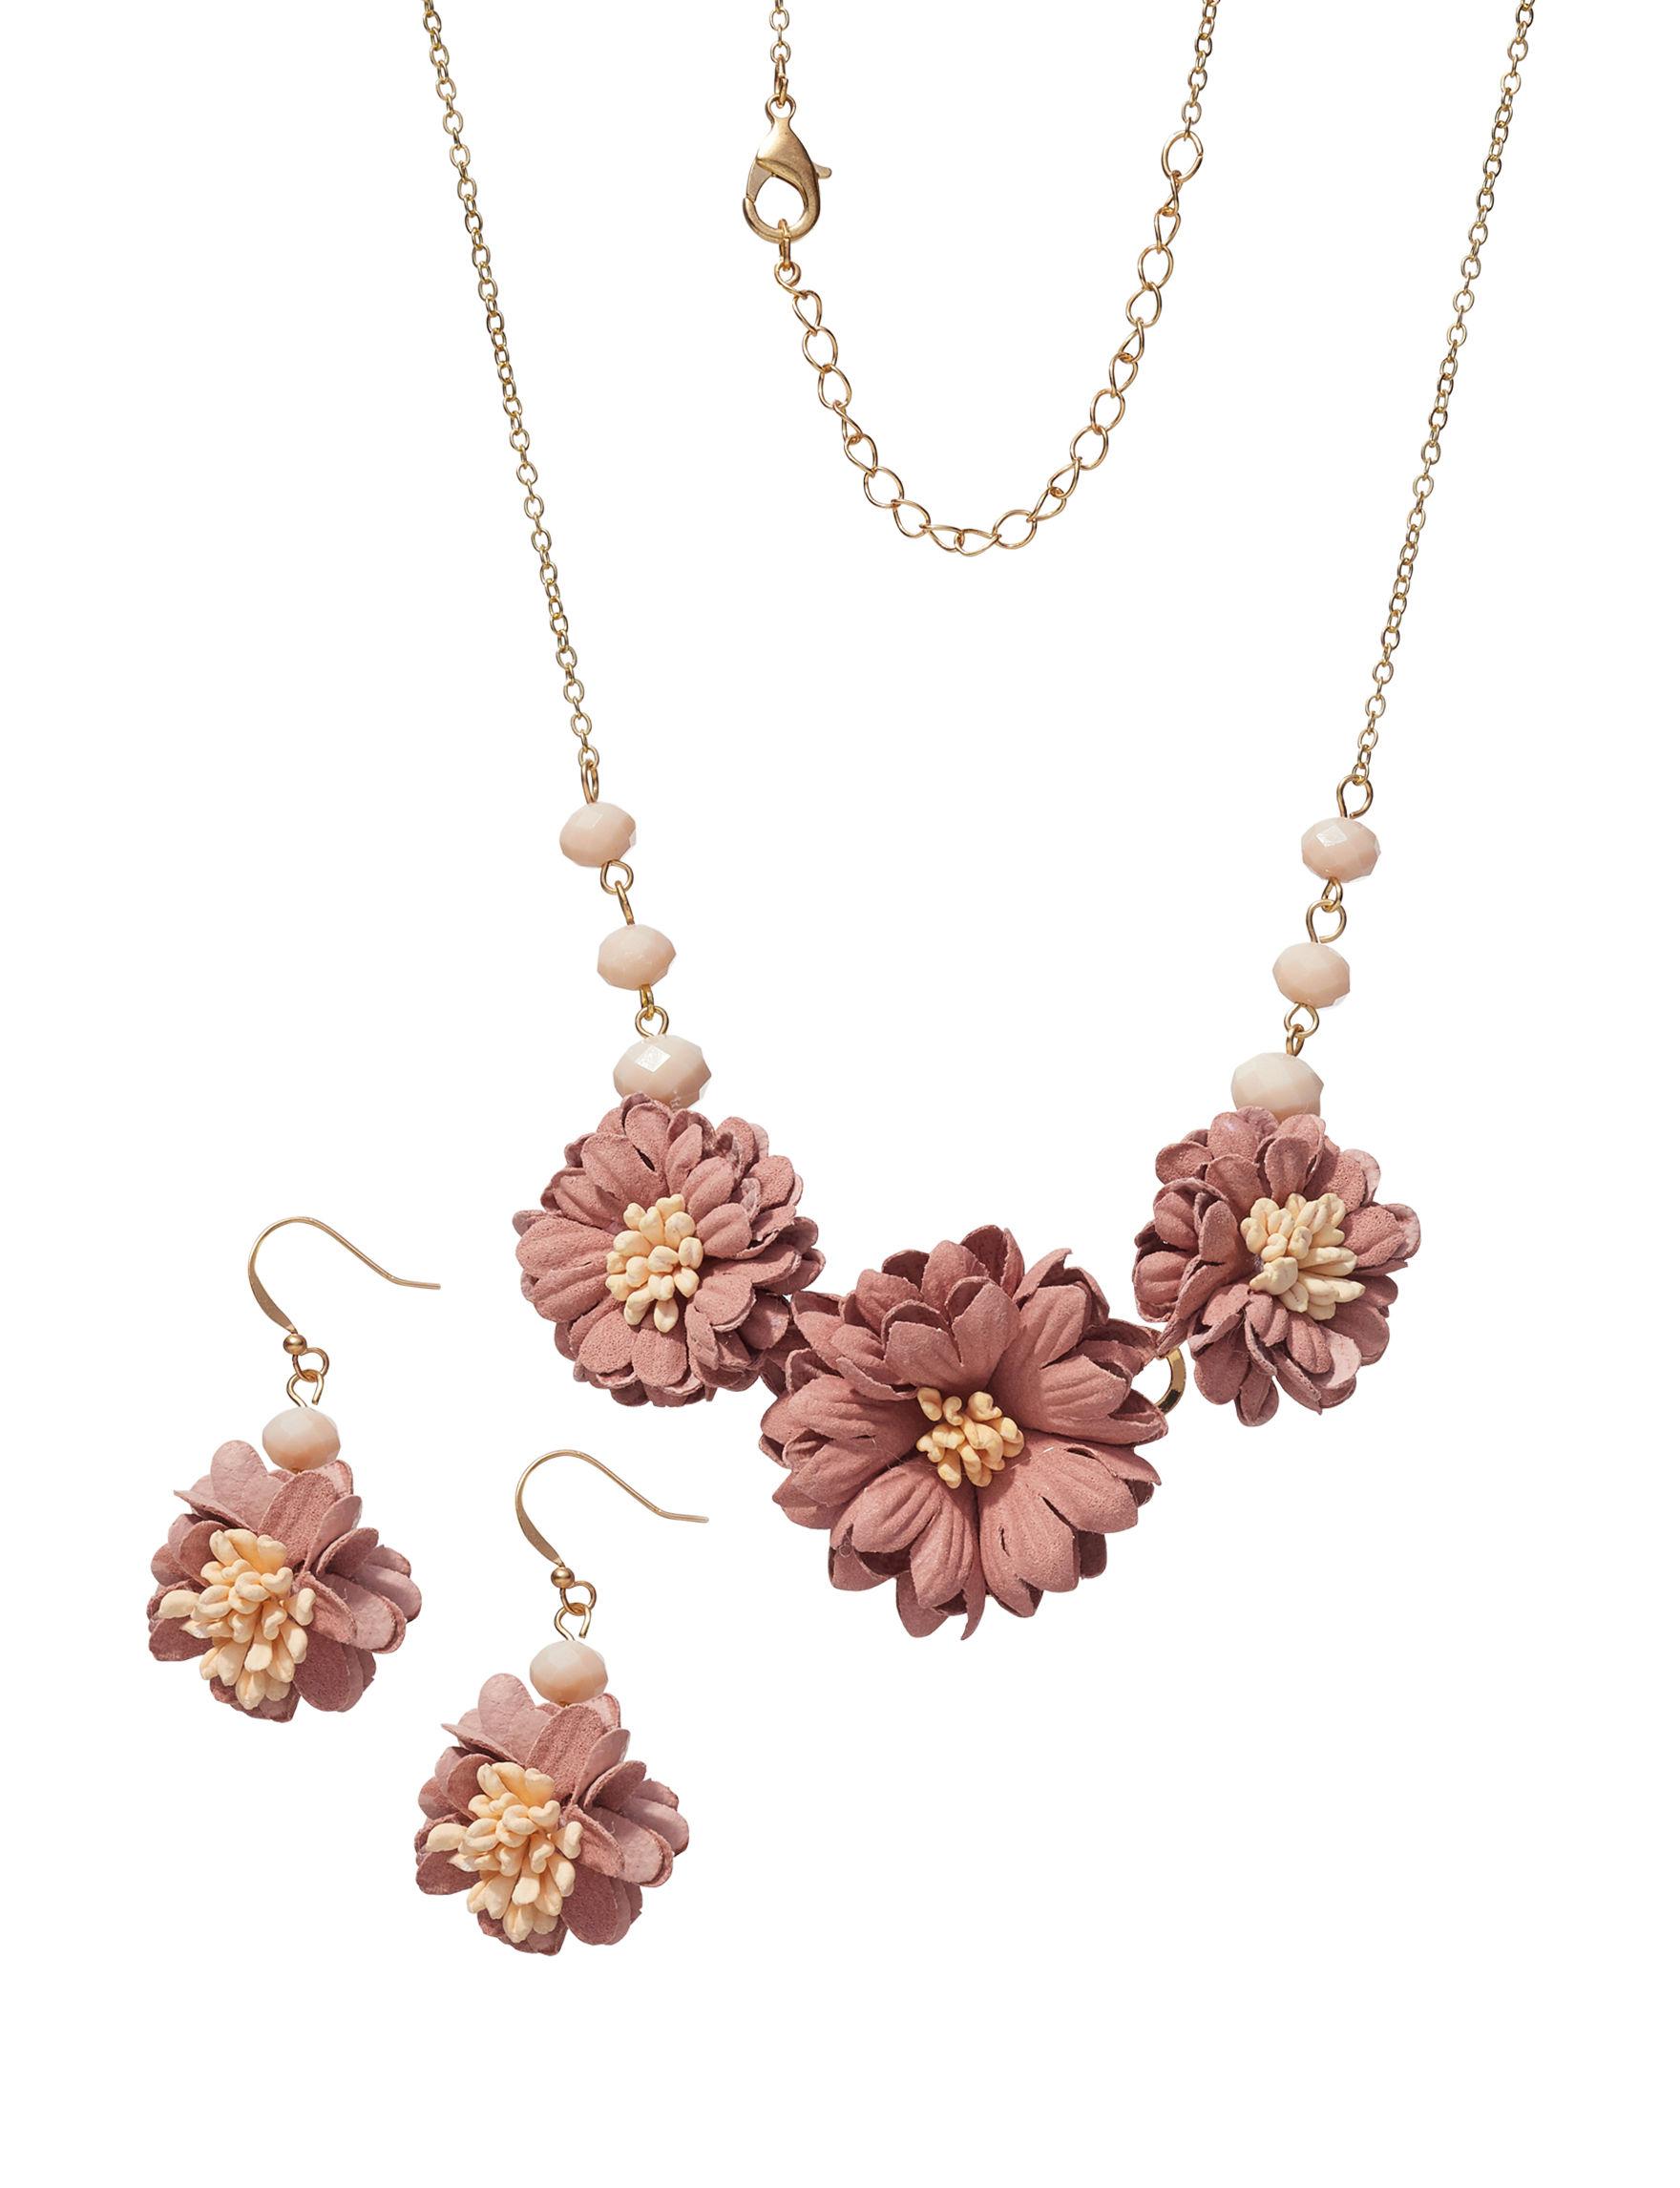 Hannah Light Orange Necklaces & Pendants Fashion Jewelry